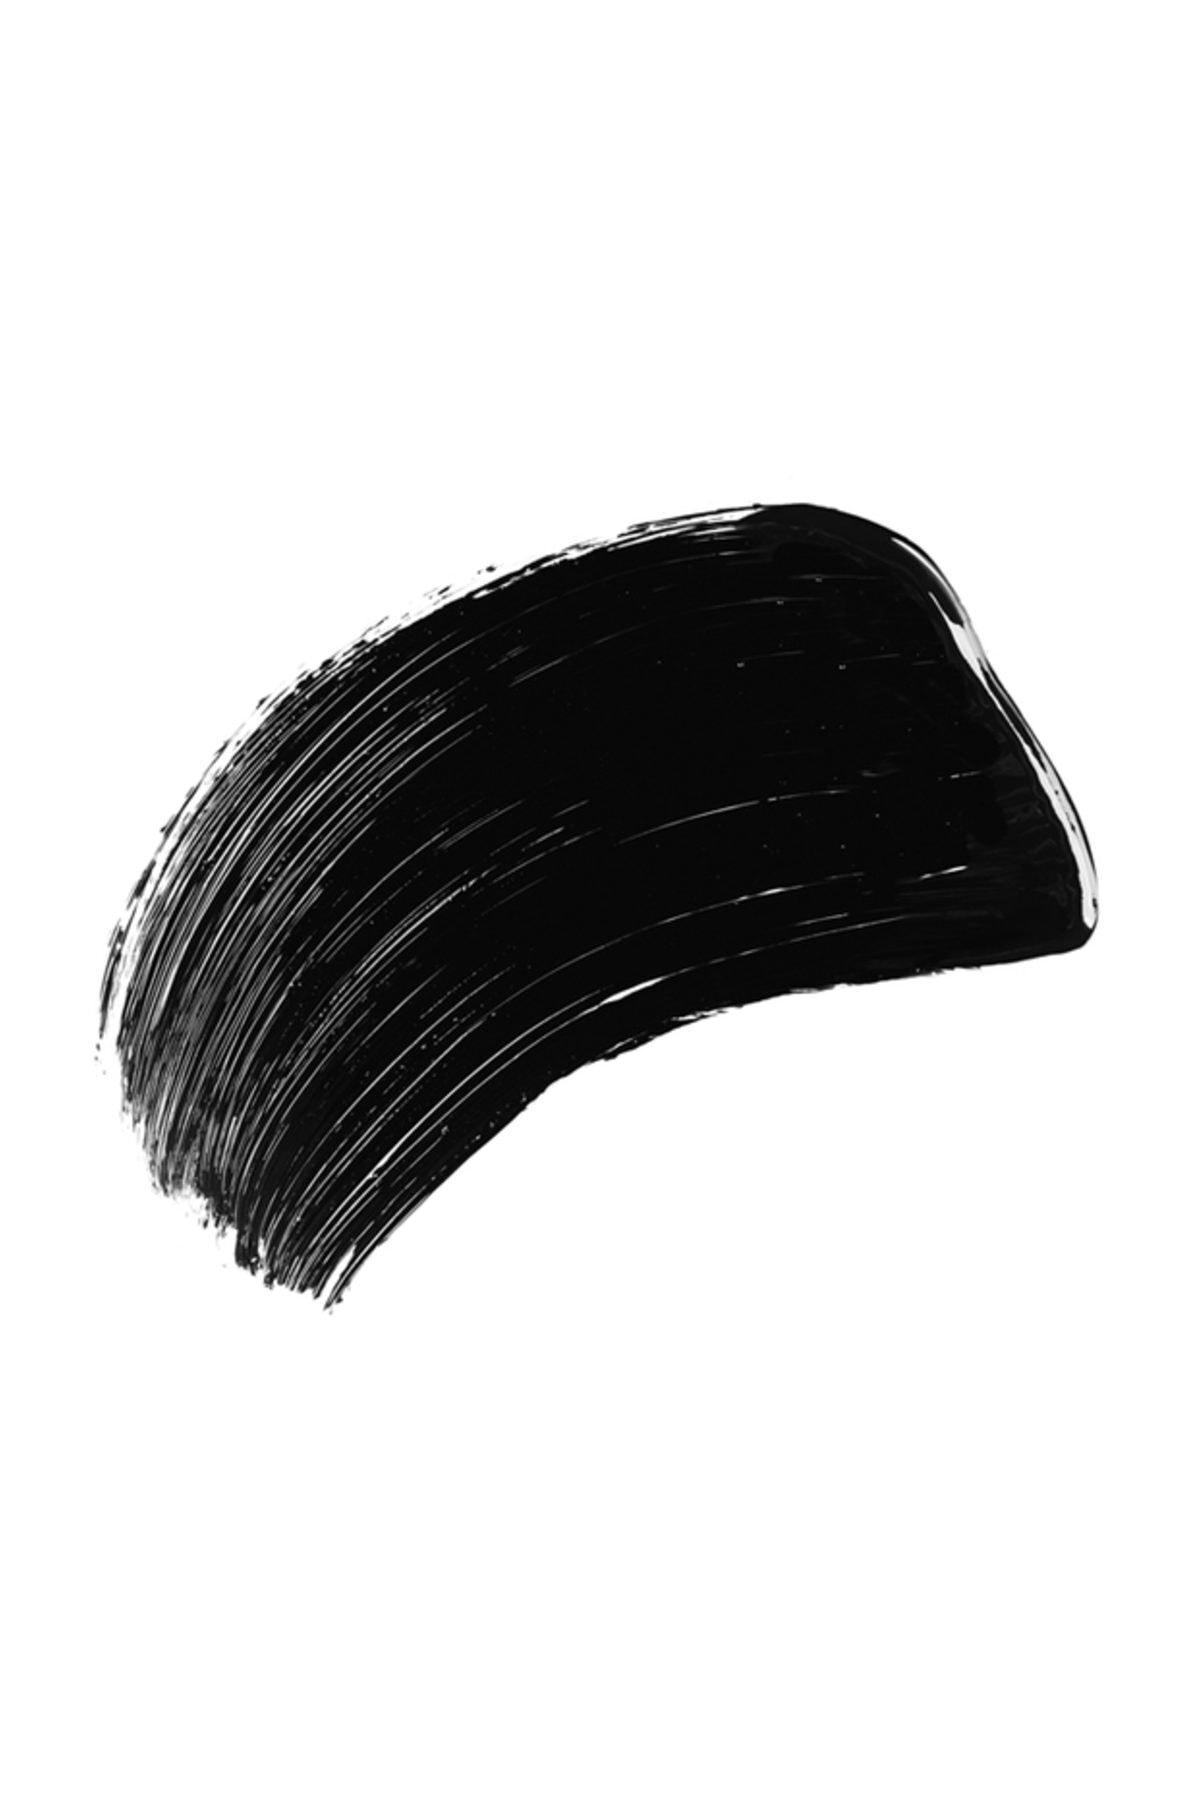 KIKO Hacim Veren ve Kıvırıcı Etkili Maskara - New Green Me Volume Mascara 101 Pure Black 2